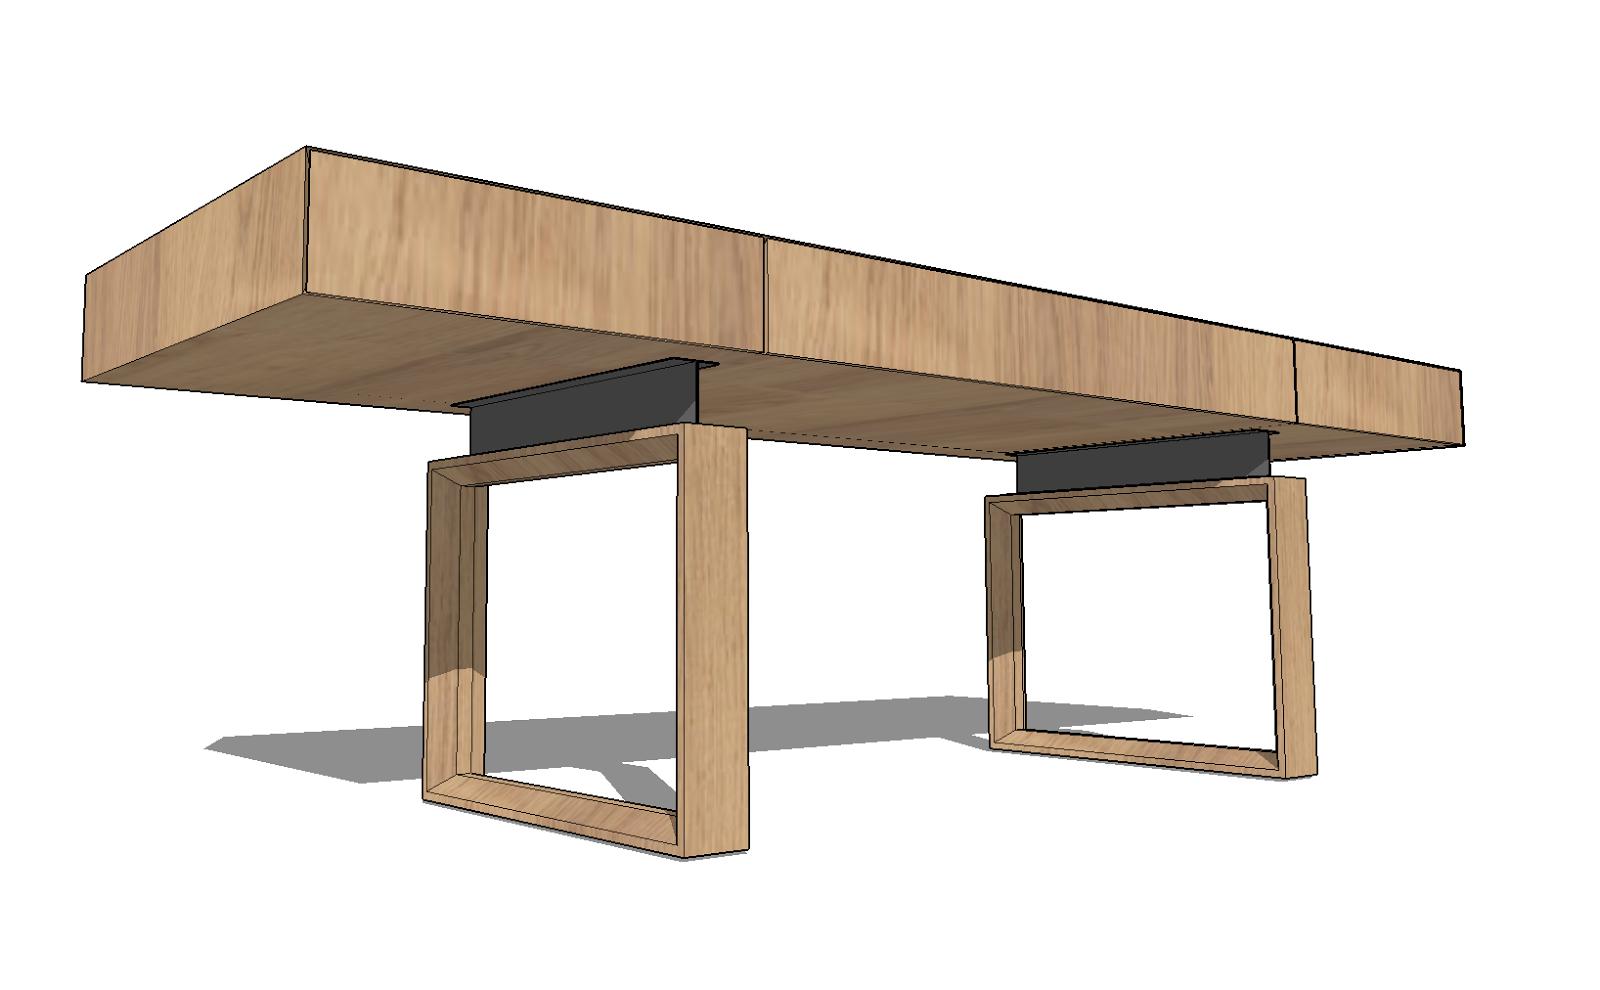 Fukusu Furniture Design Modern Minimalist Wooden Steel Dining Table And Study Table Desk